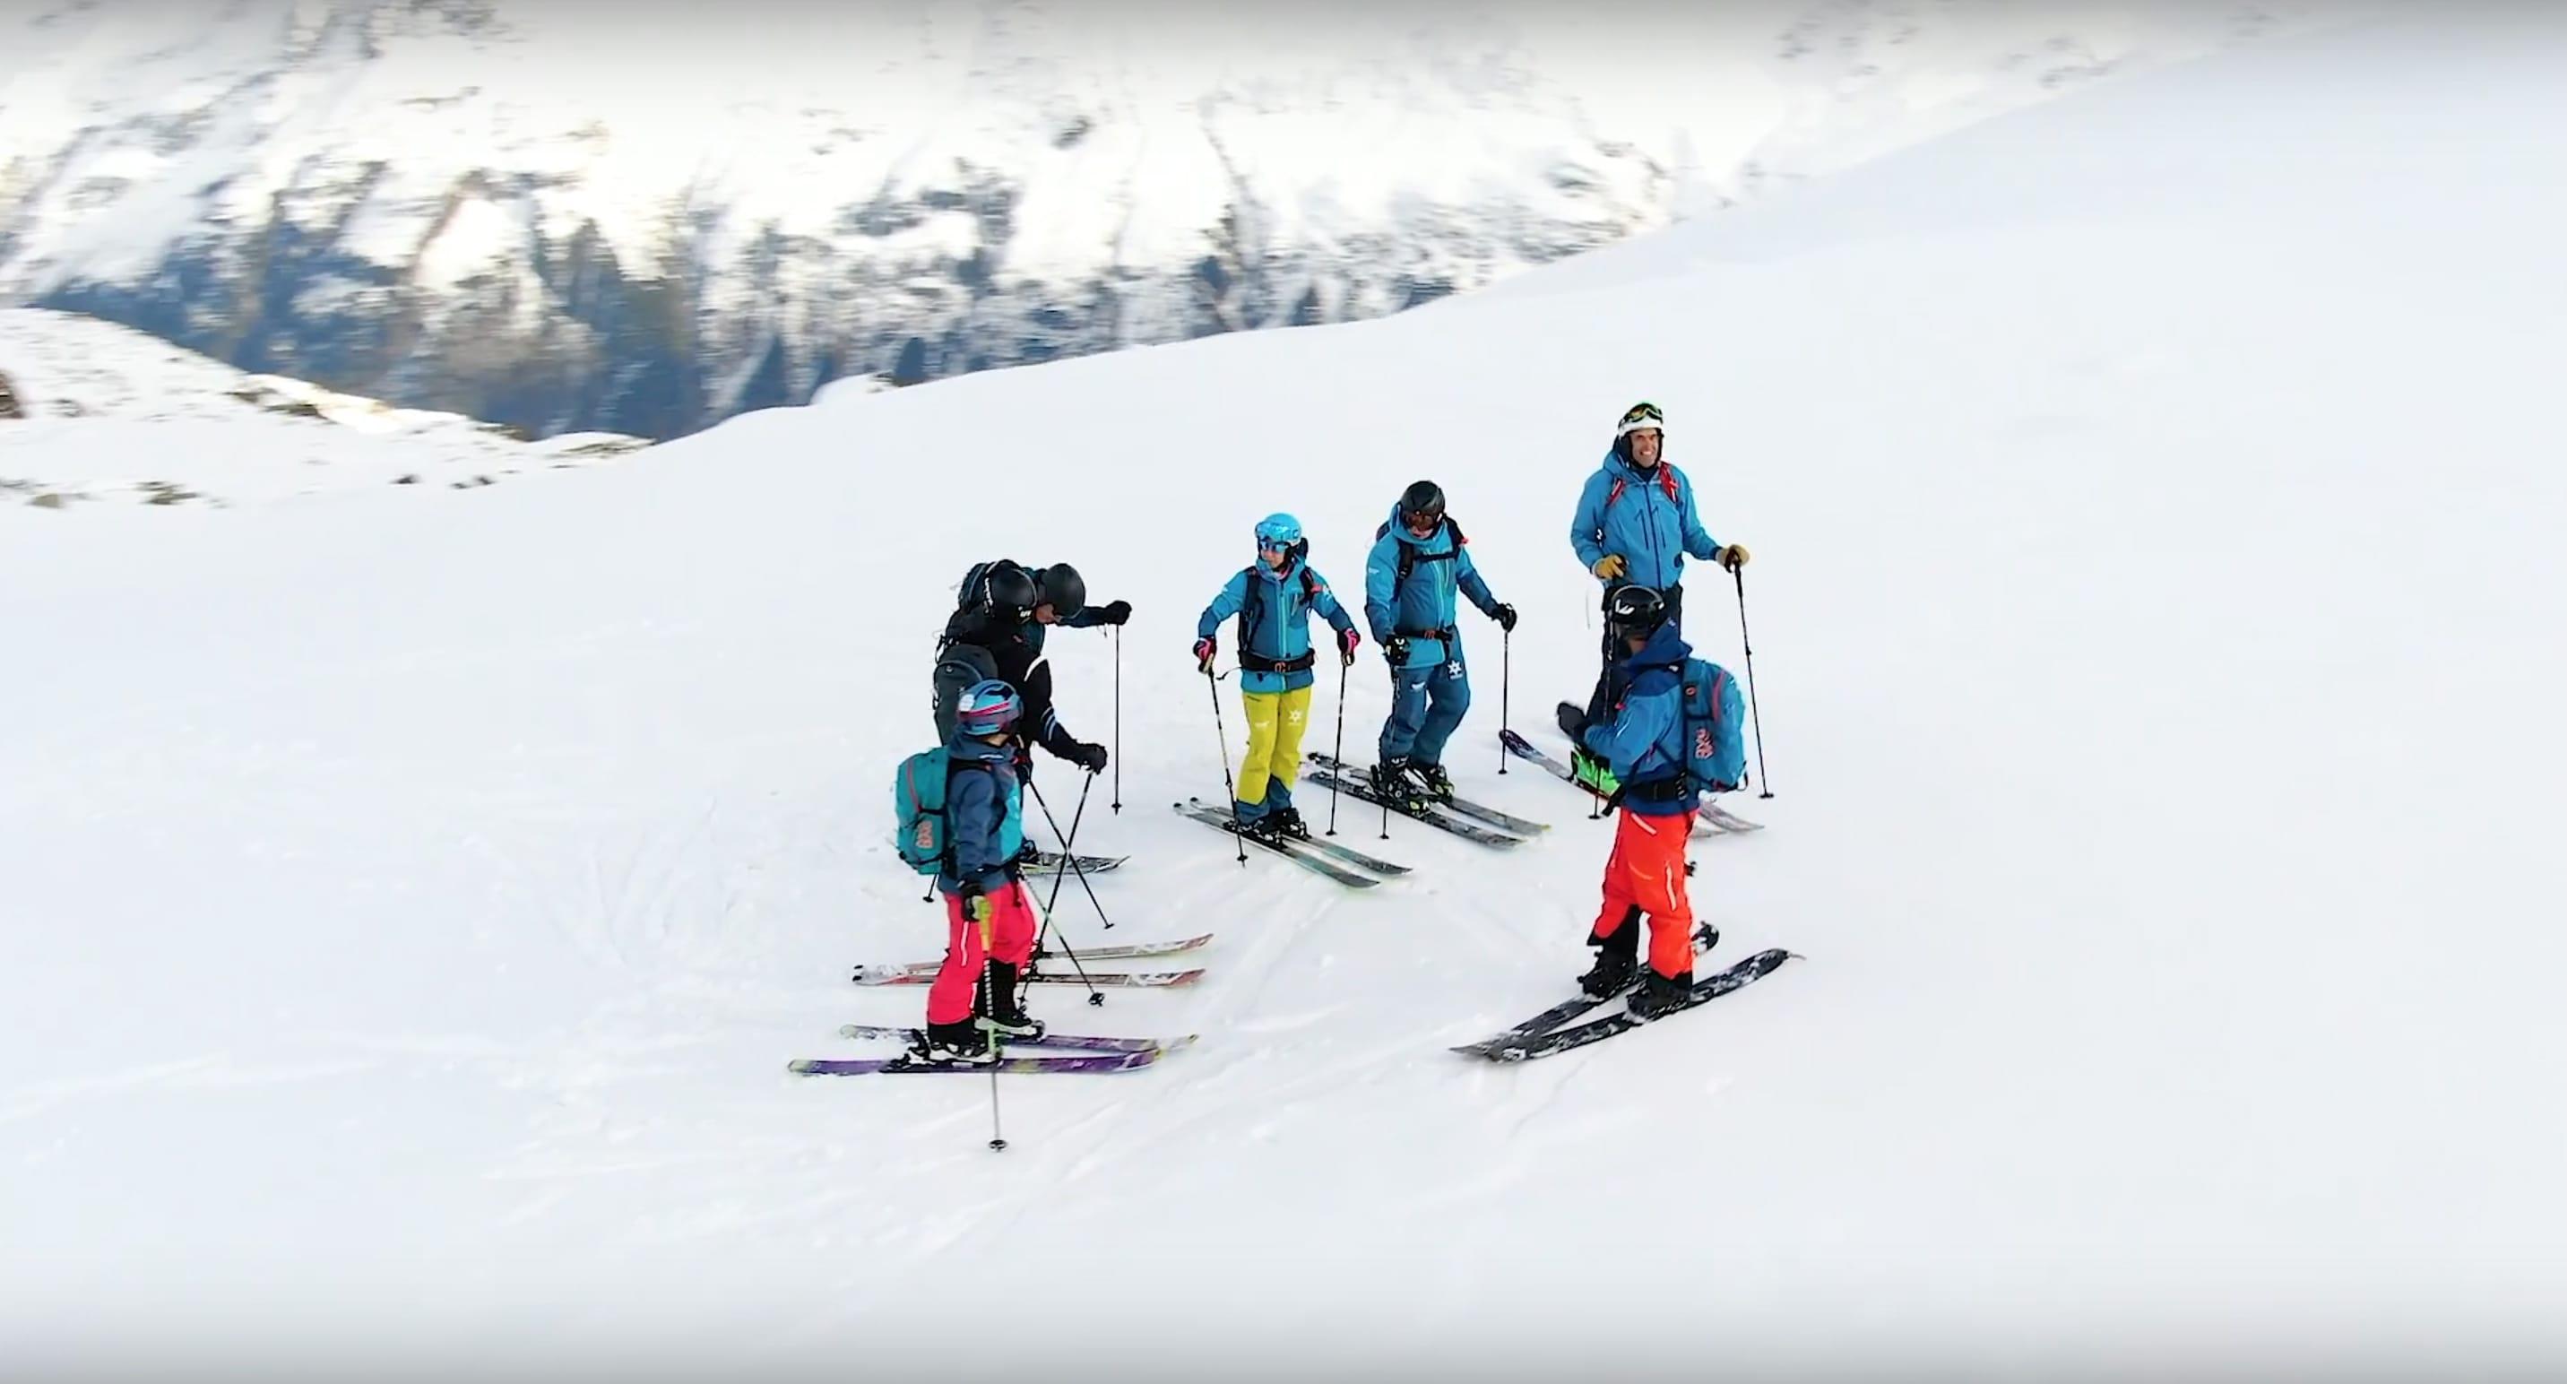 Contact | Double Dutch Mountain Events